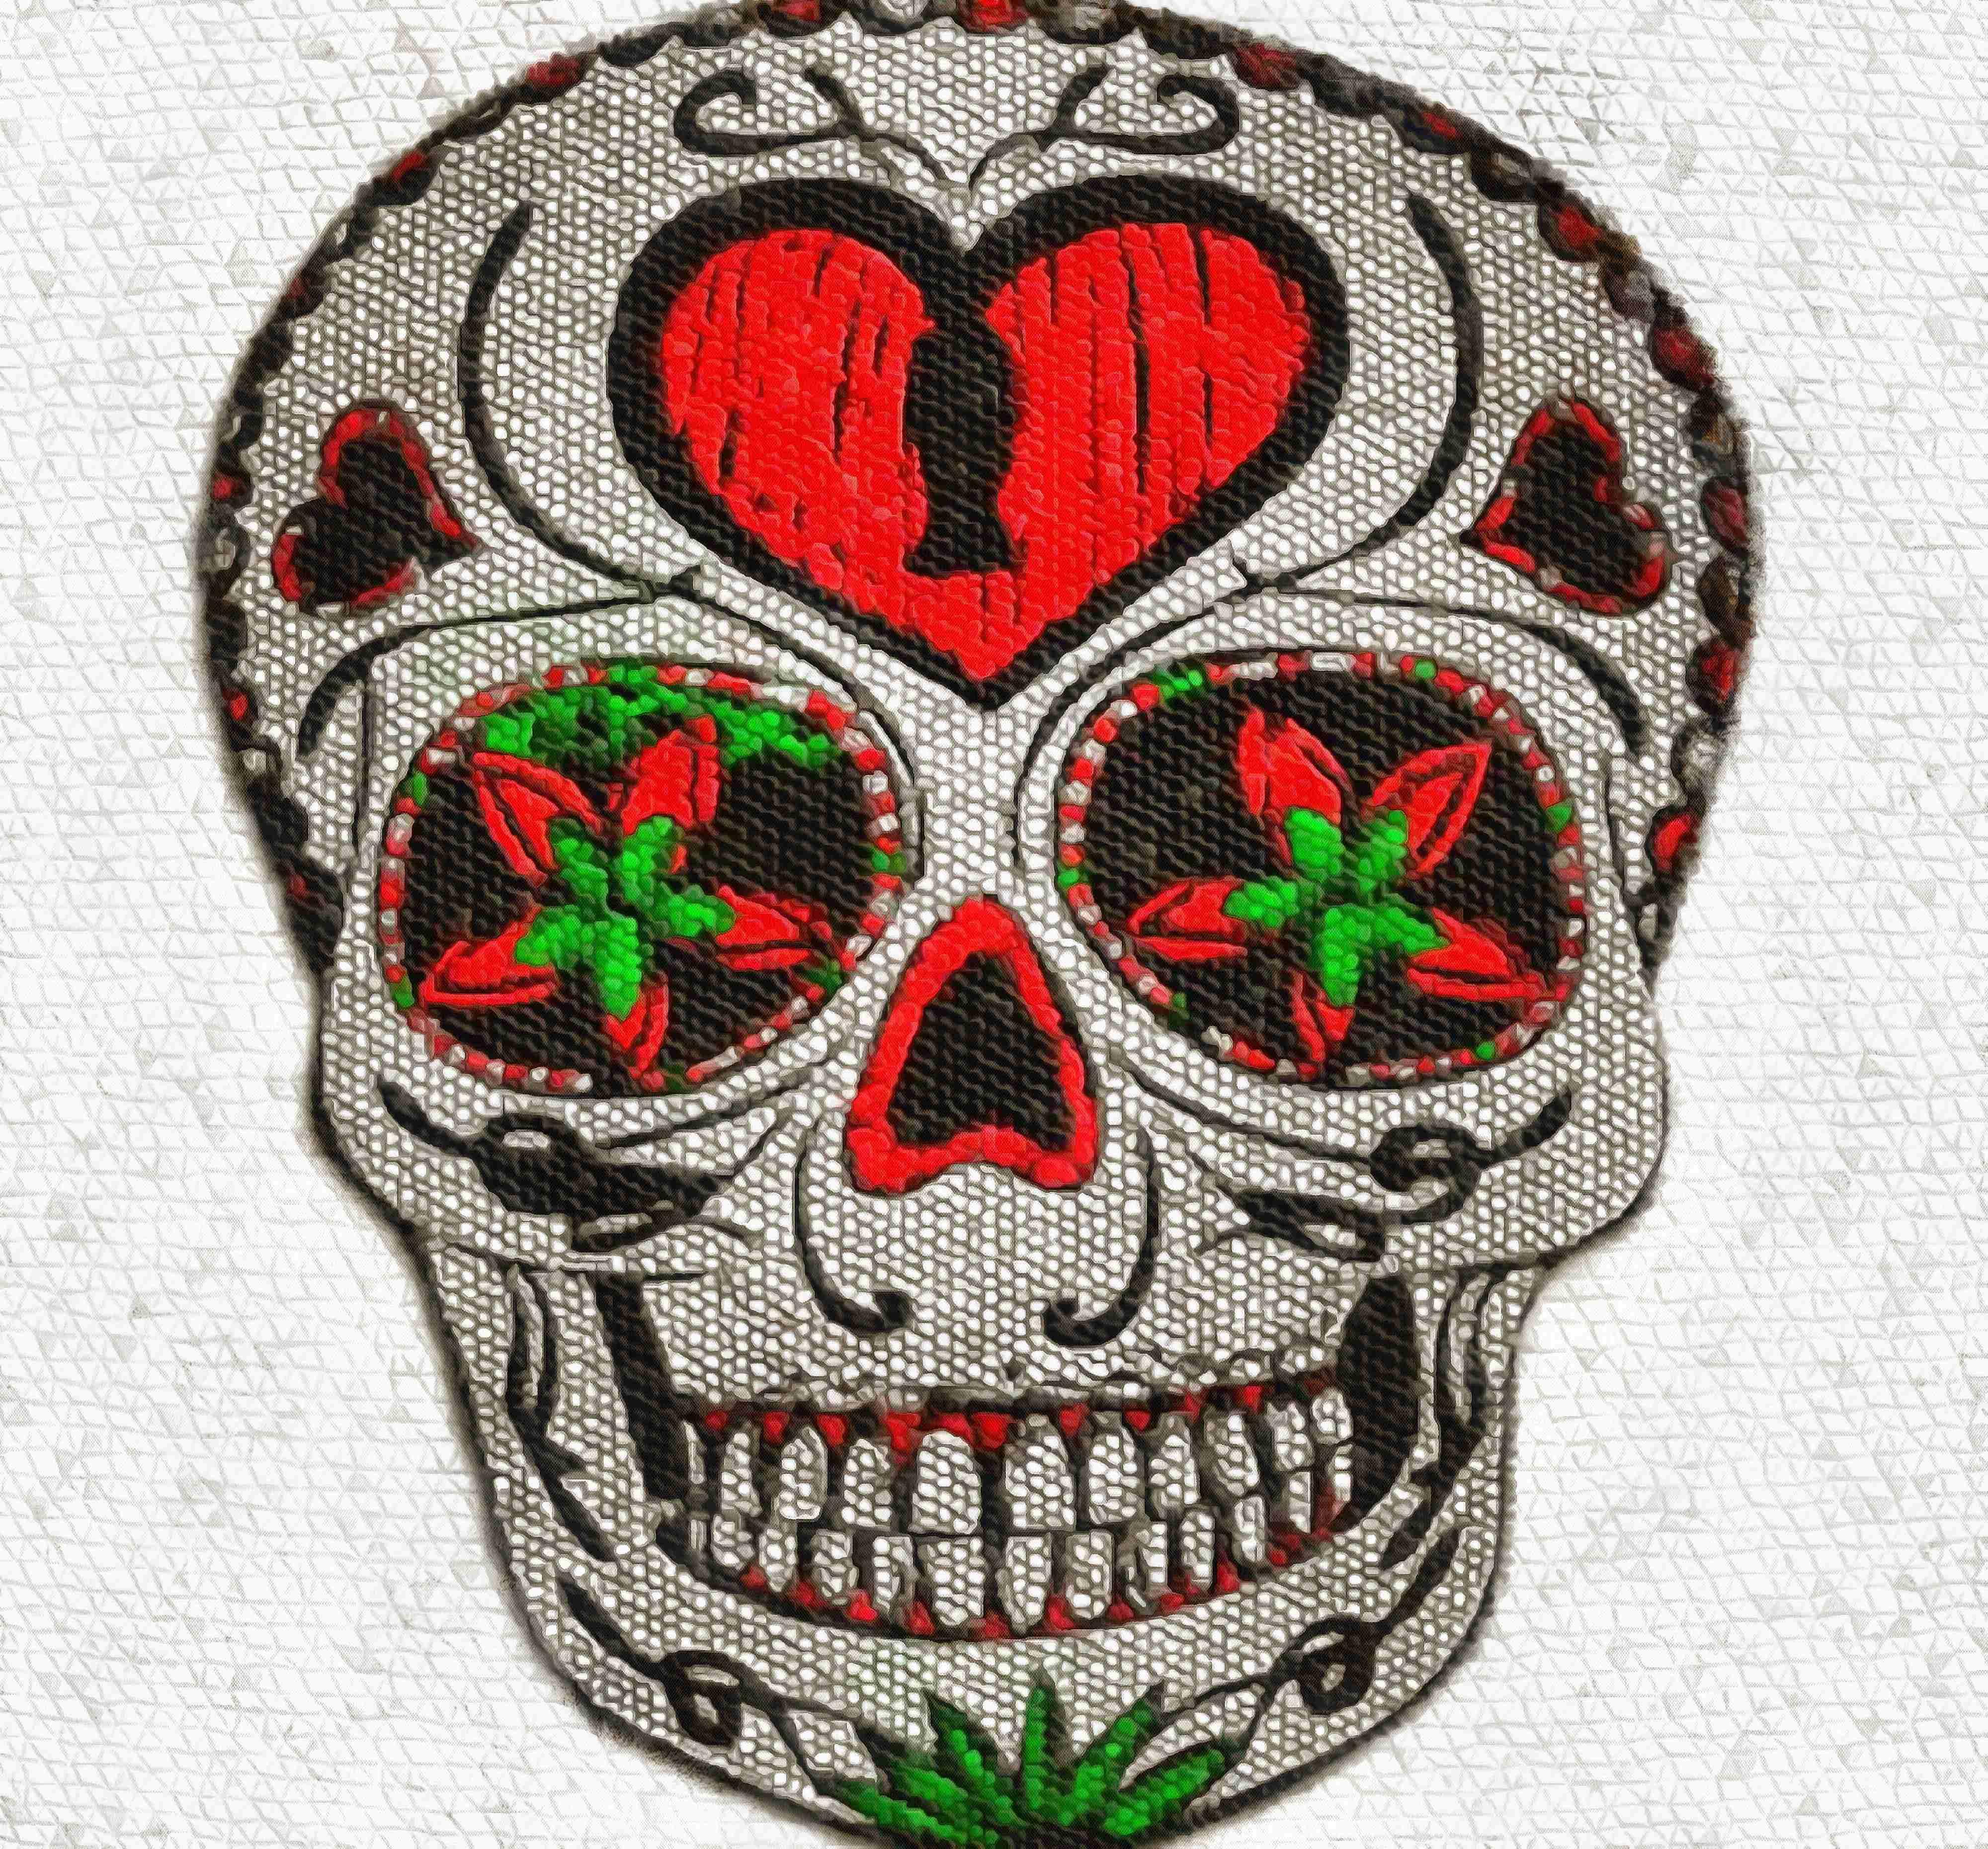 skull, head, bones, horror, skeleton, halloween - halloween free image, free images, public domain images, stock free images, download image for free, halloween stock free images